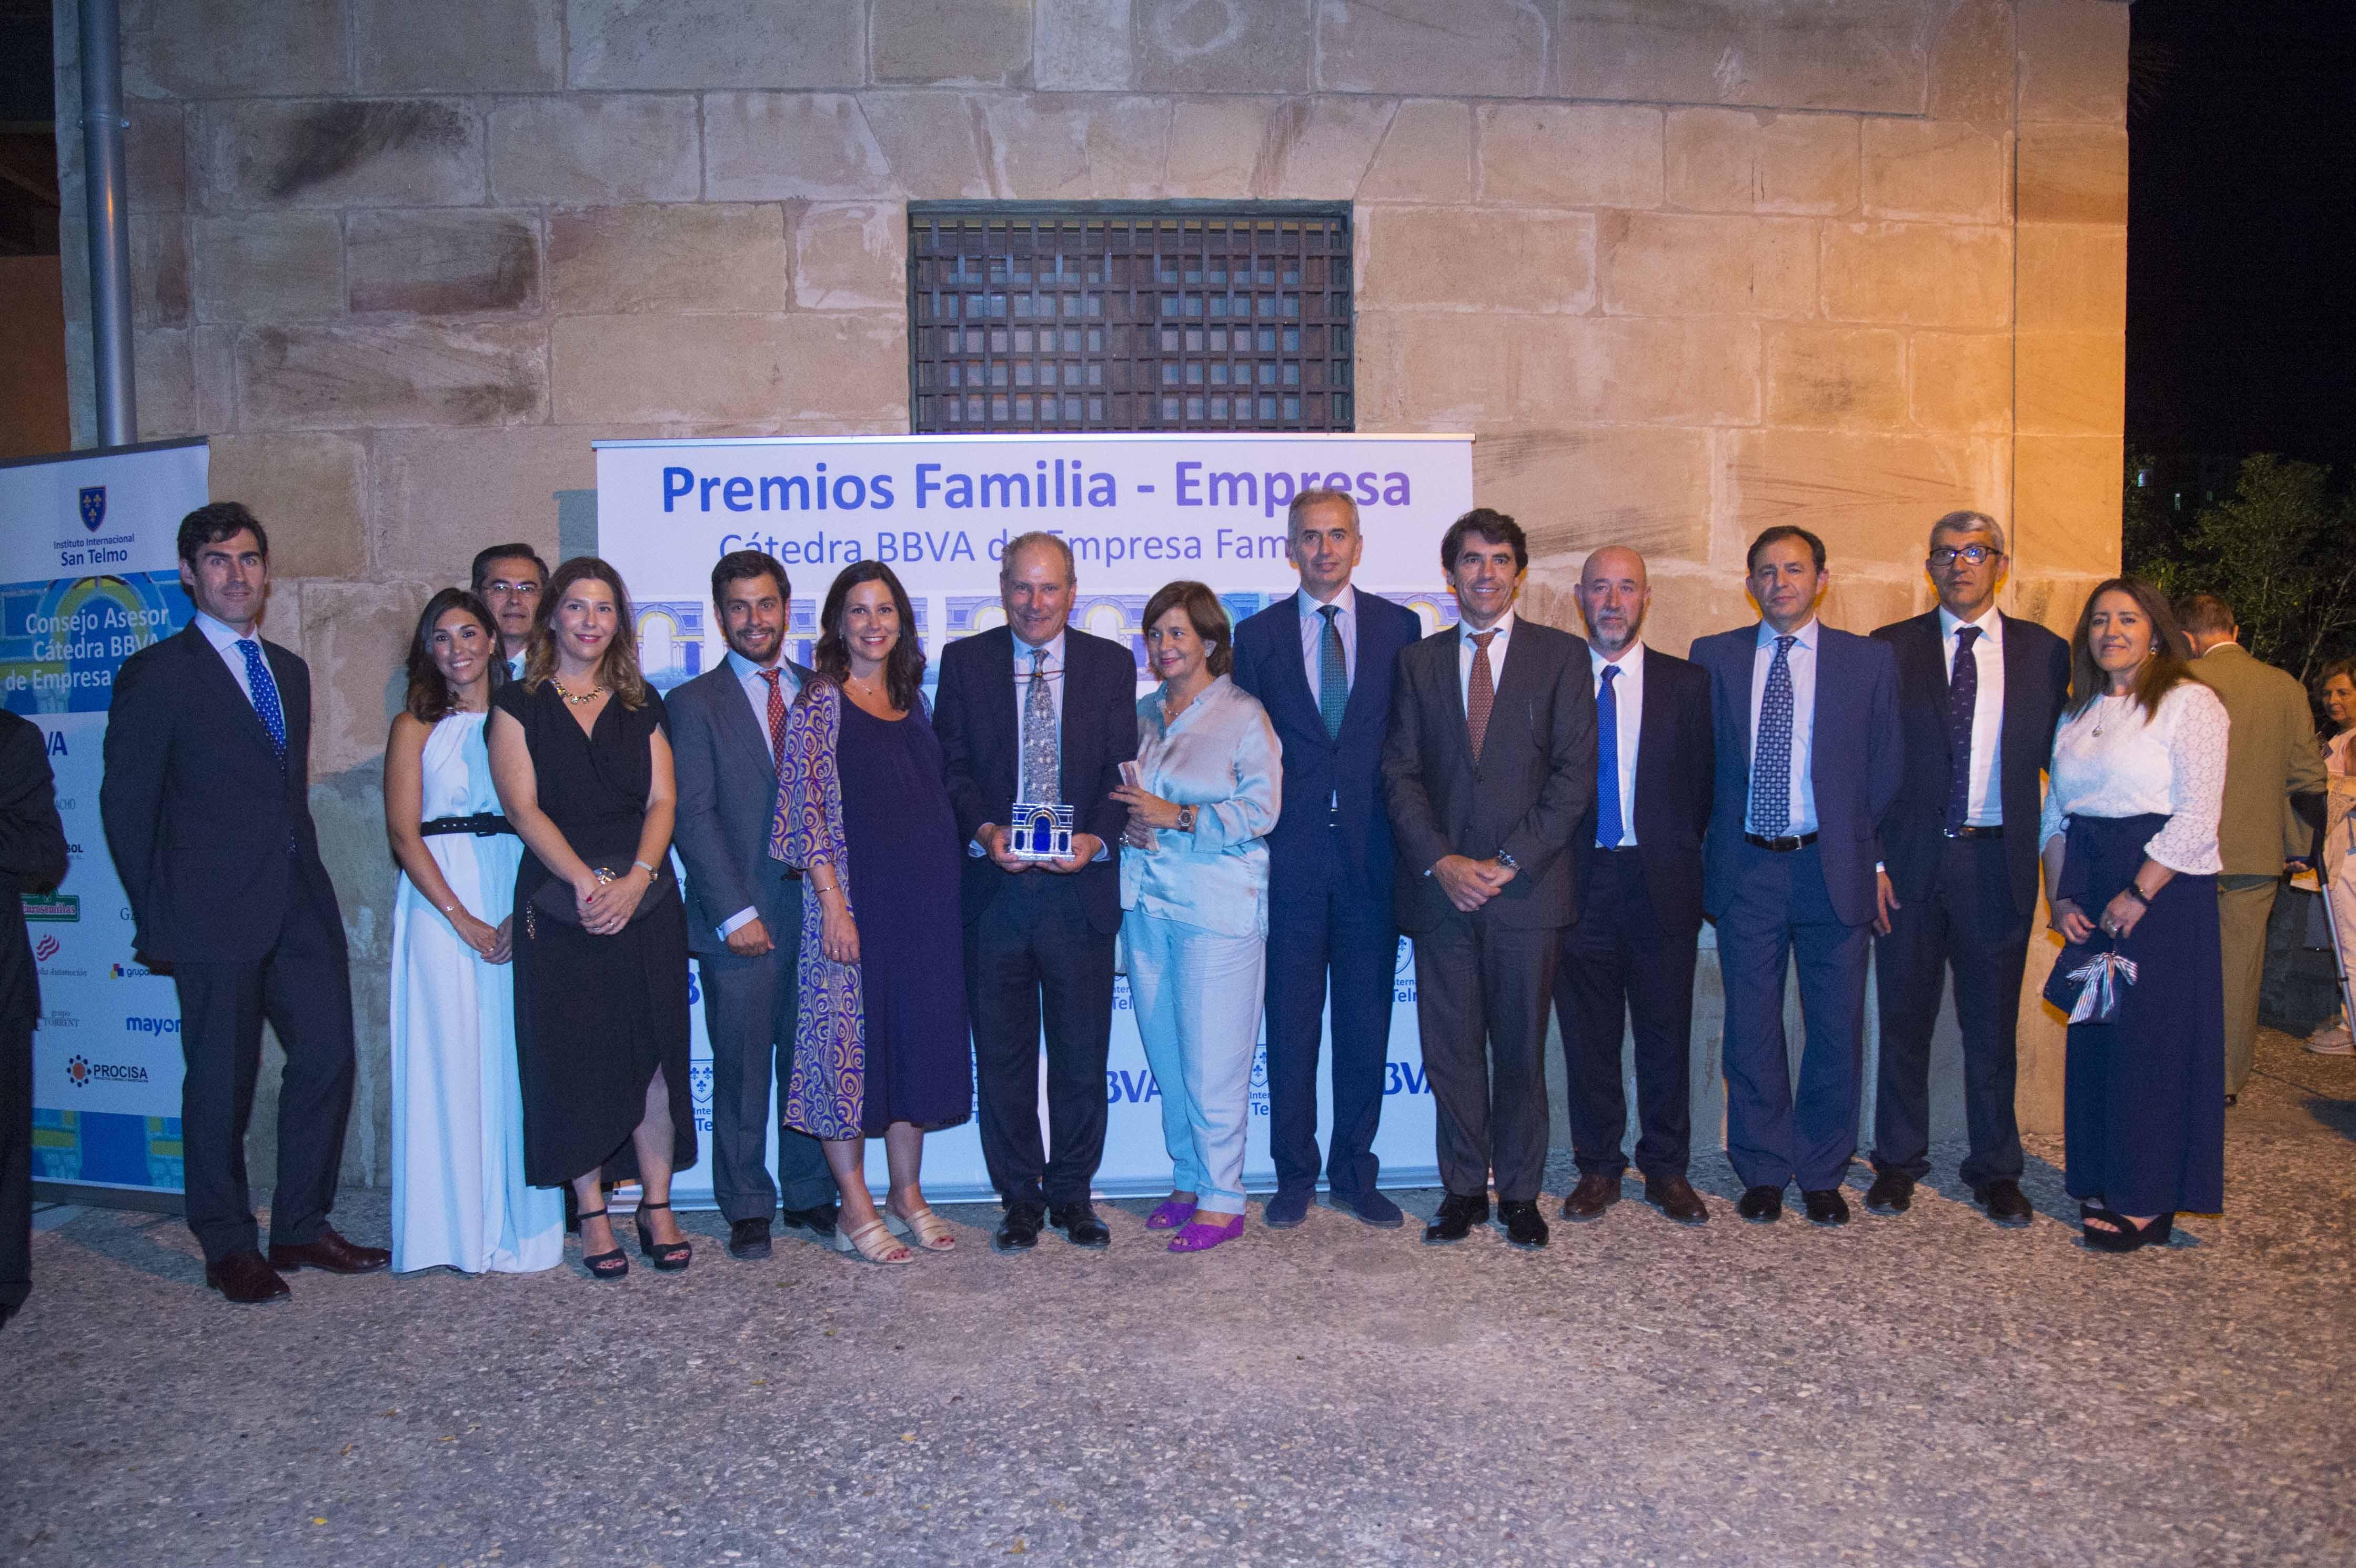 52. 05-07-18 Premios Familia Empresa 2018 (200)